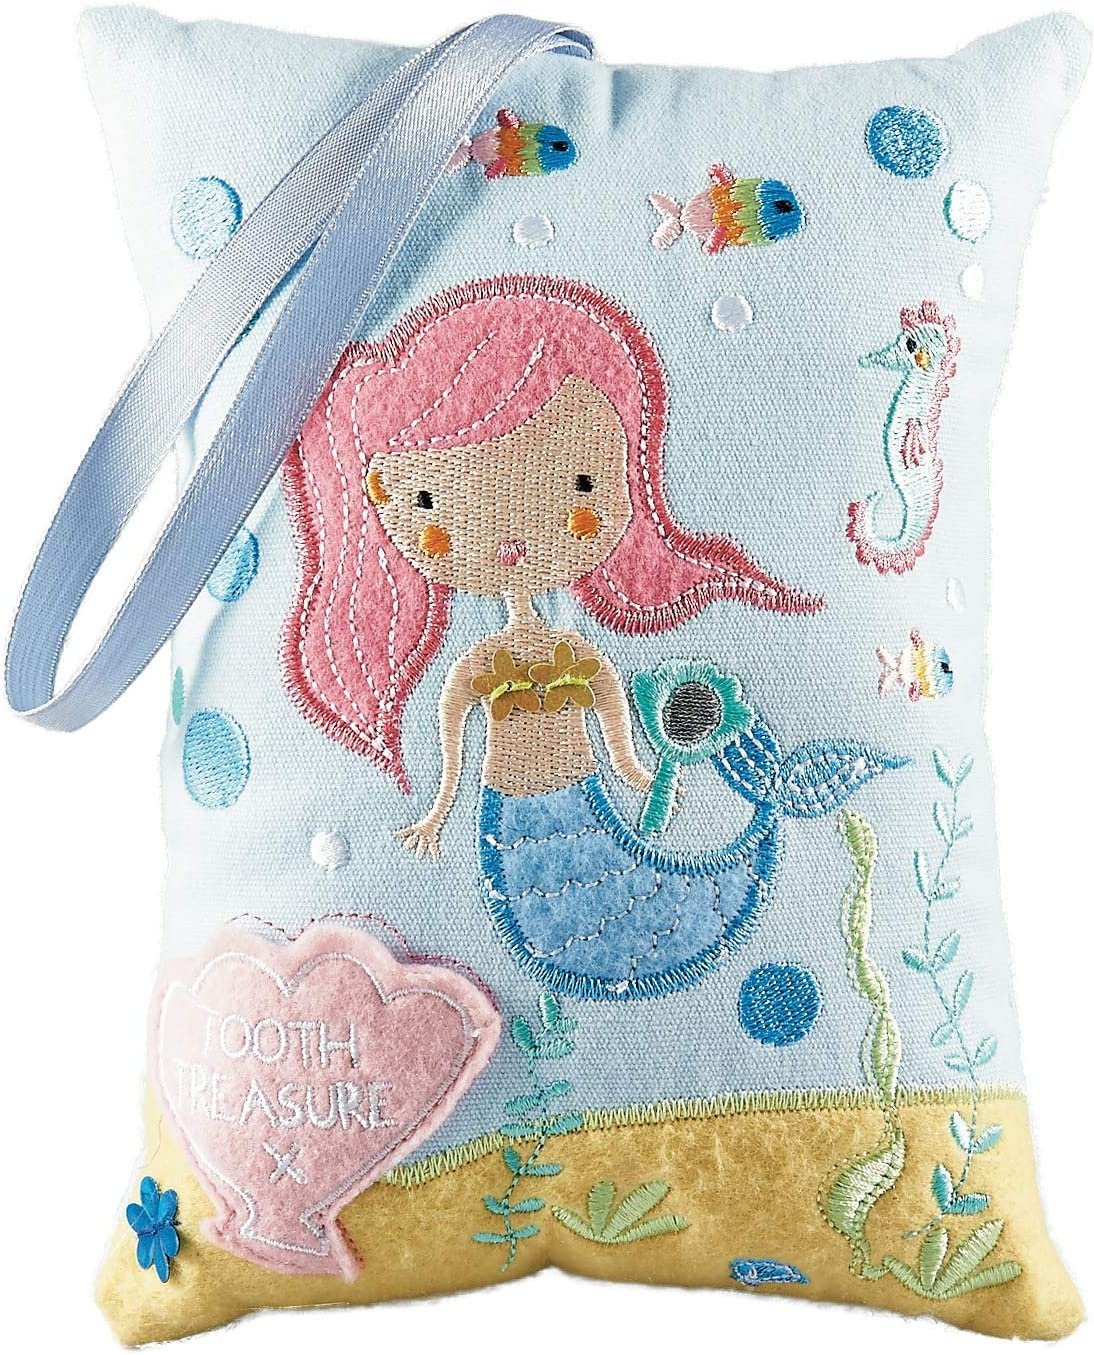 Mermaid Pocket Pillow